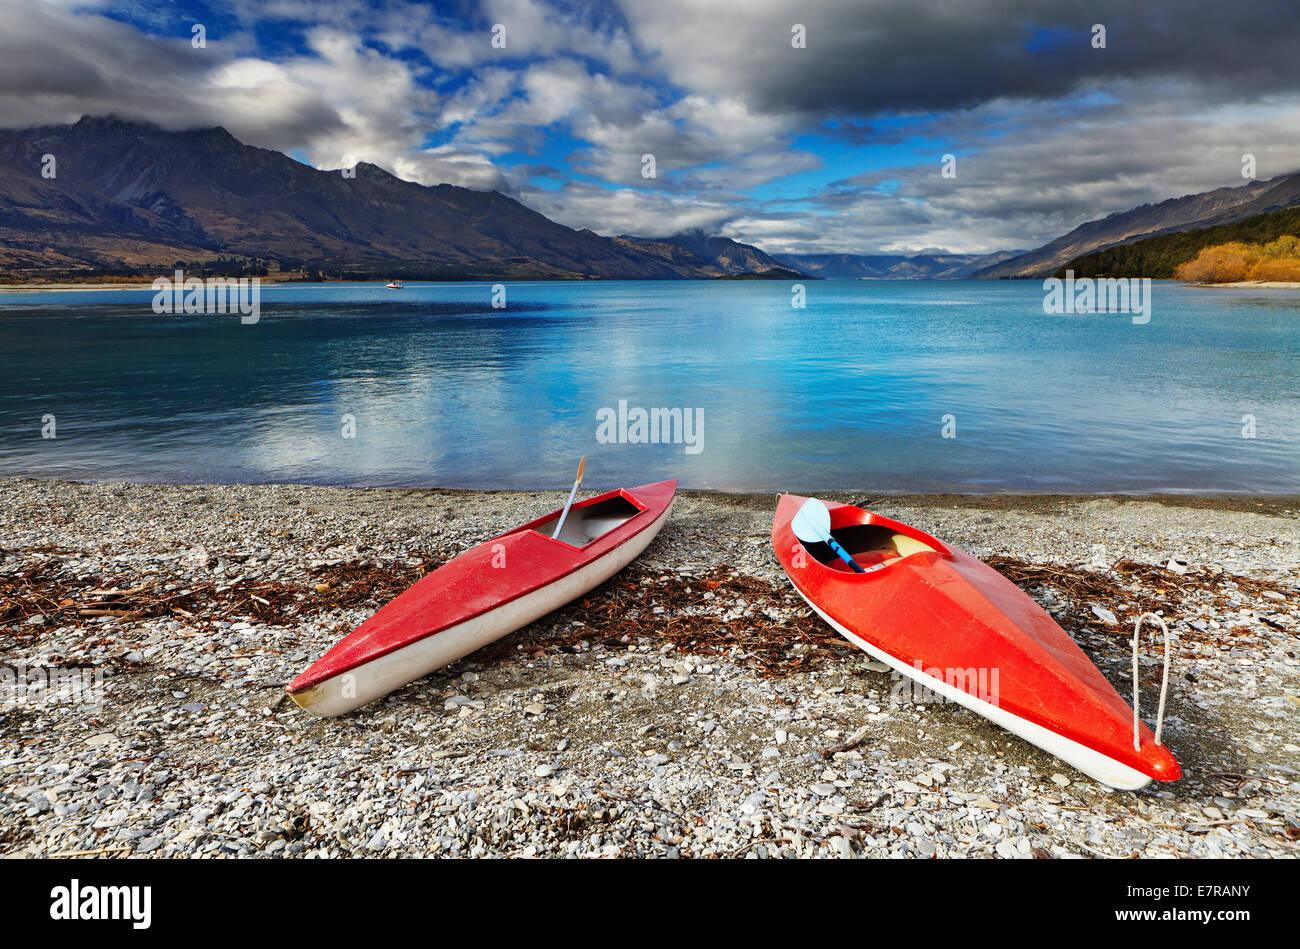 Red kayaks at the lakeside, Wakatipu Lake, New Zealand - Stock Image